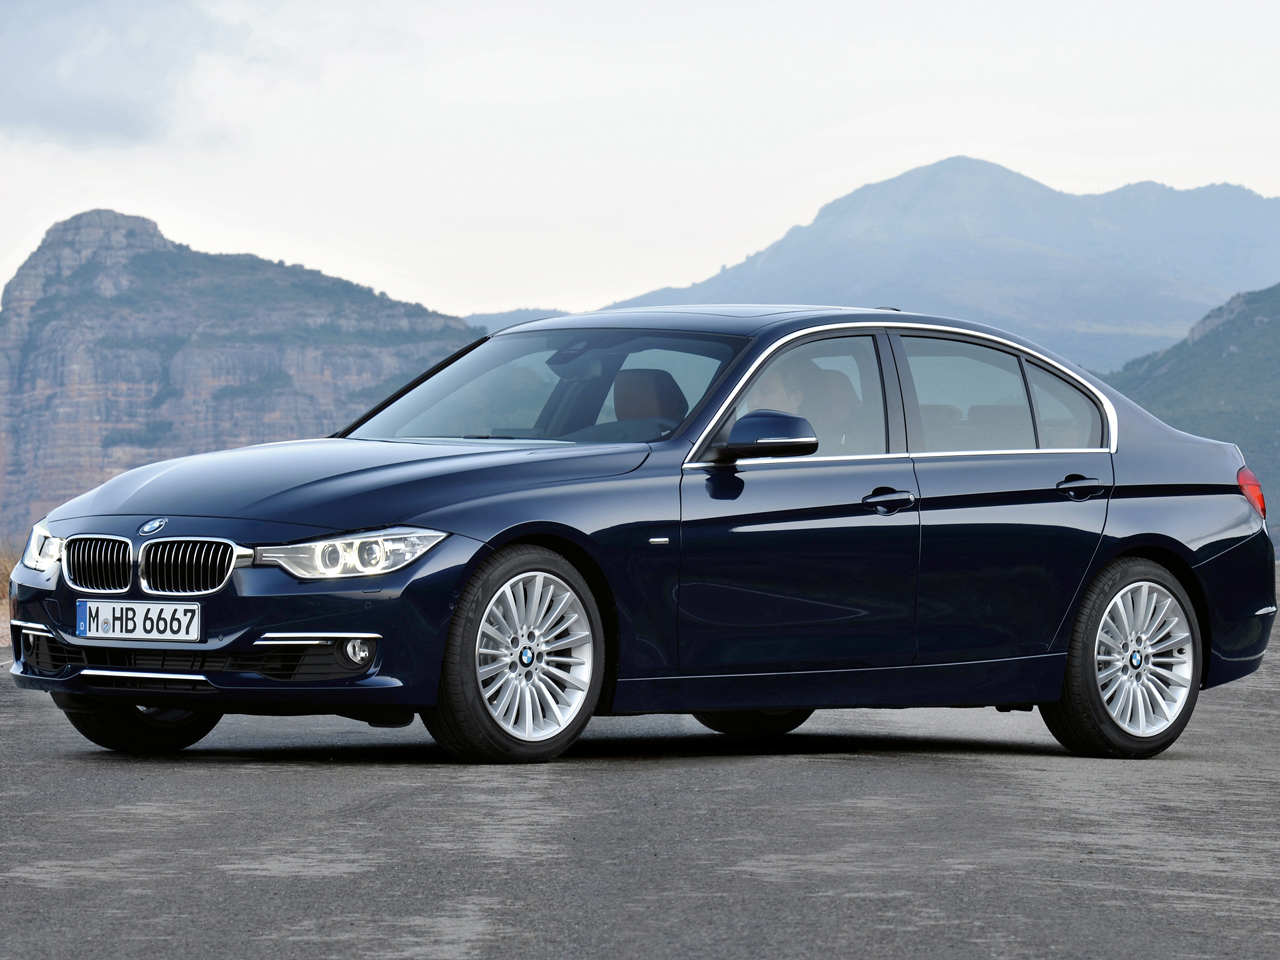 BMW 3シリーズ セダン 2012年モデル 新車画像